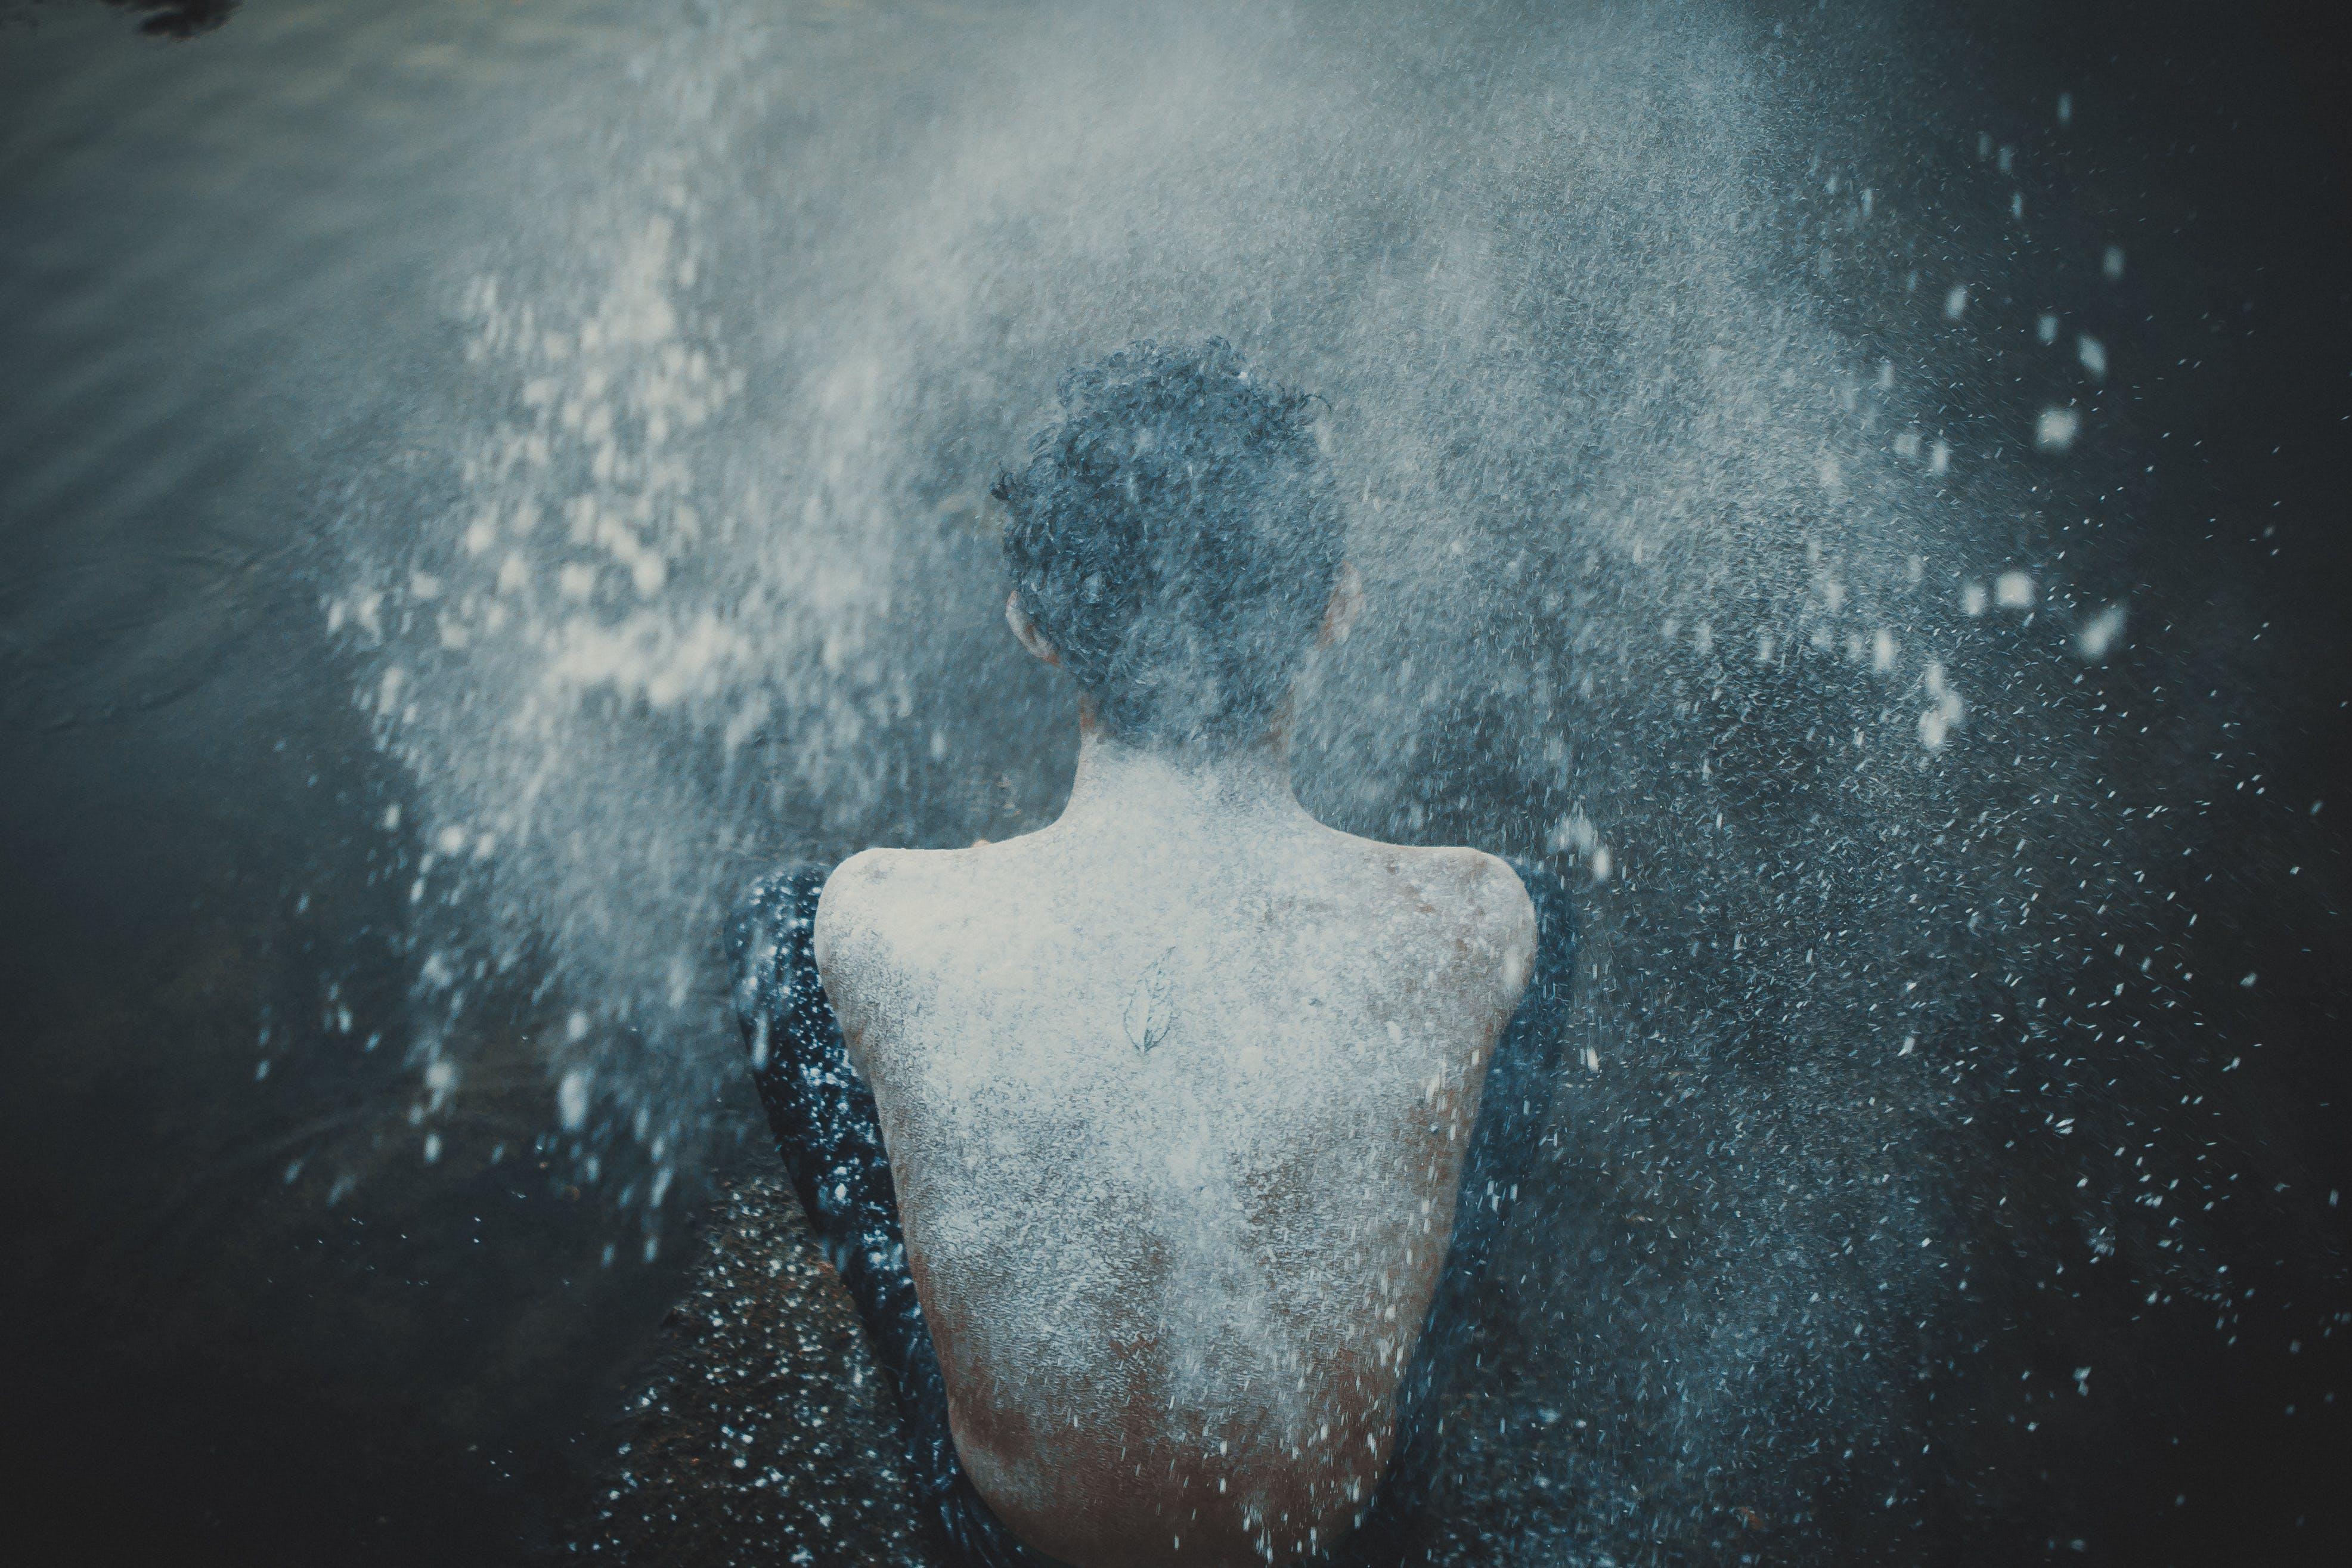 Person Splashing Powder on His Back